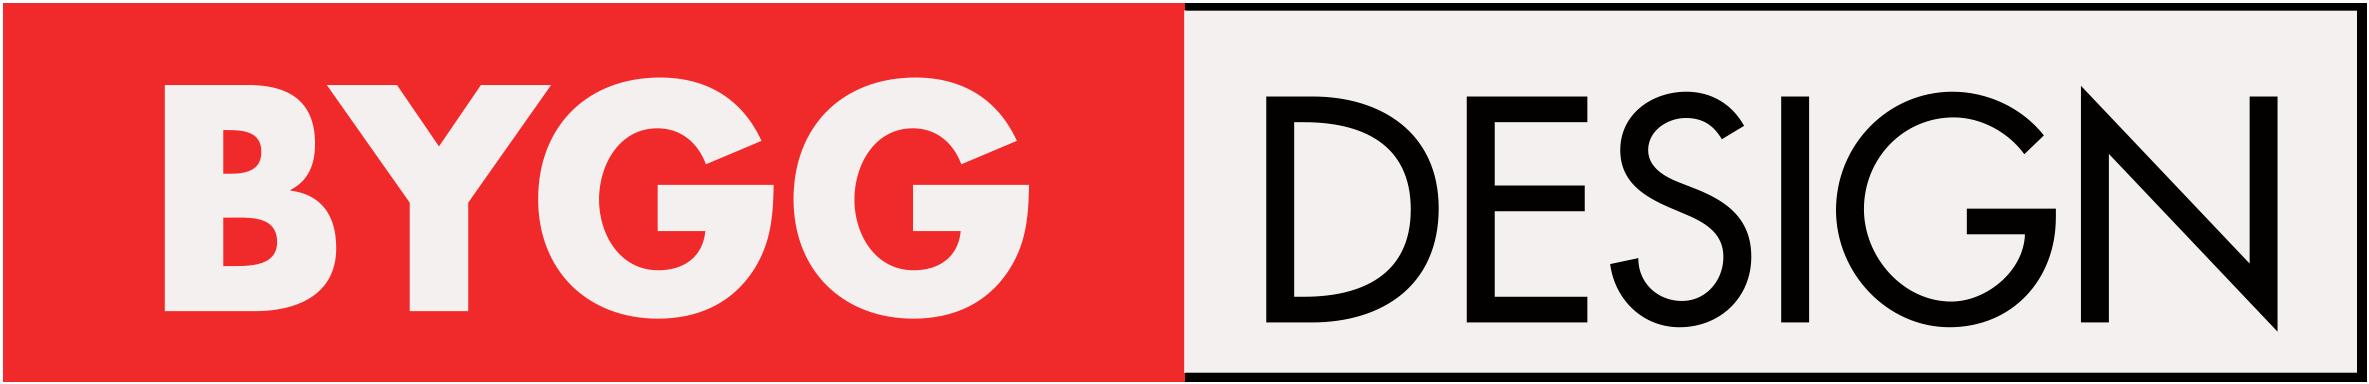 Byggdesign. Logo